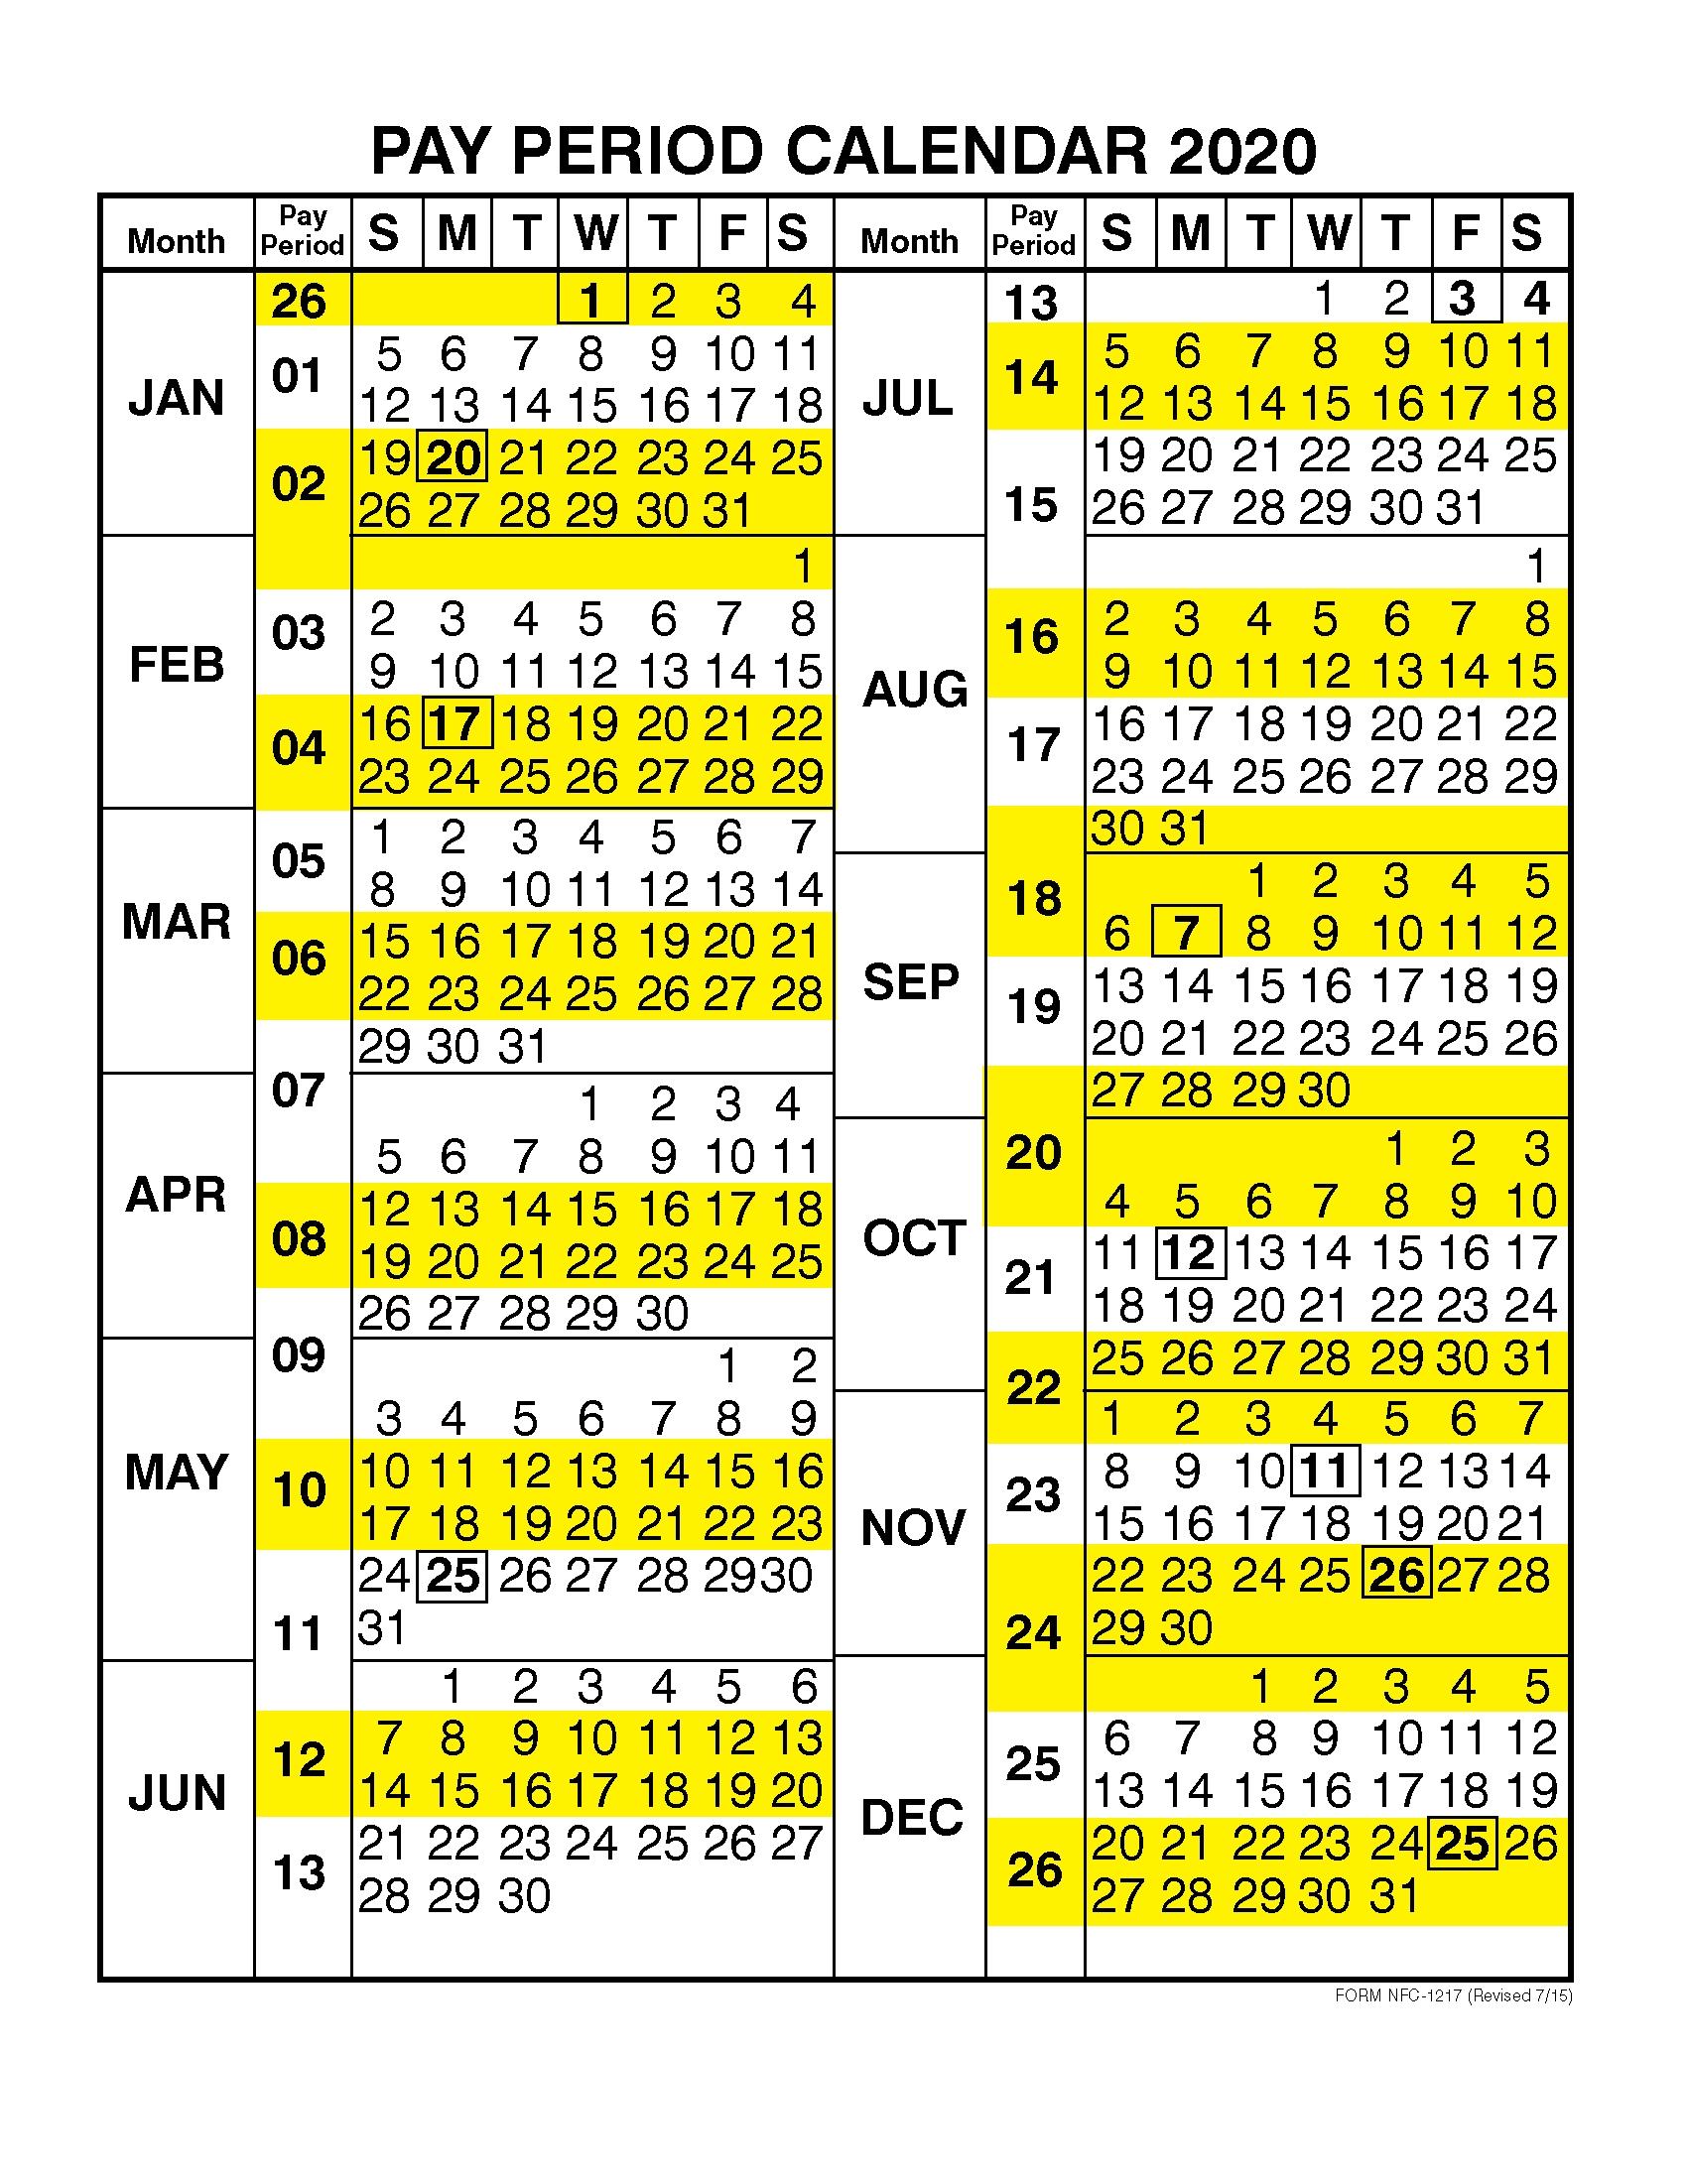 Pay Period Calendar 2020Calendar Year | Free Printable 2019 throughout Federal Pay Period Calendar 2020